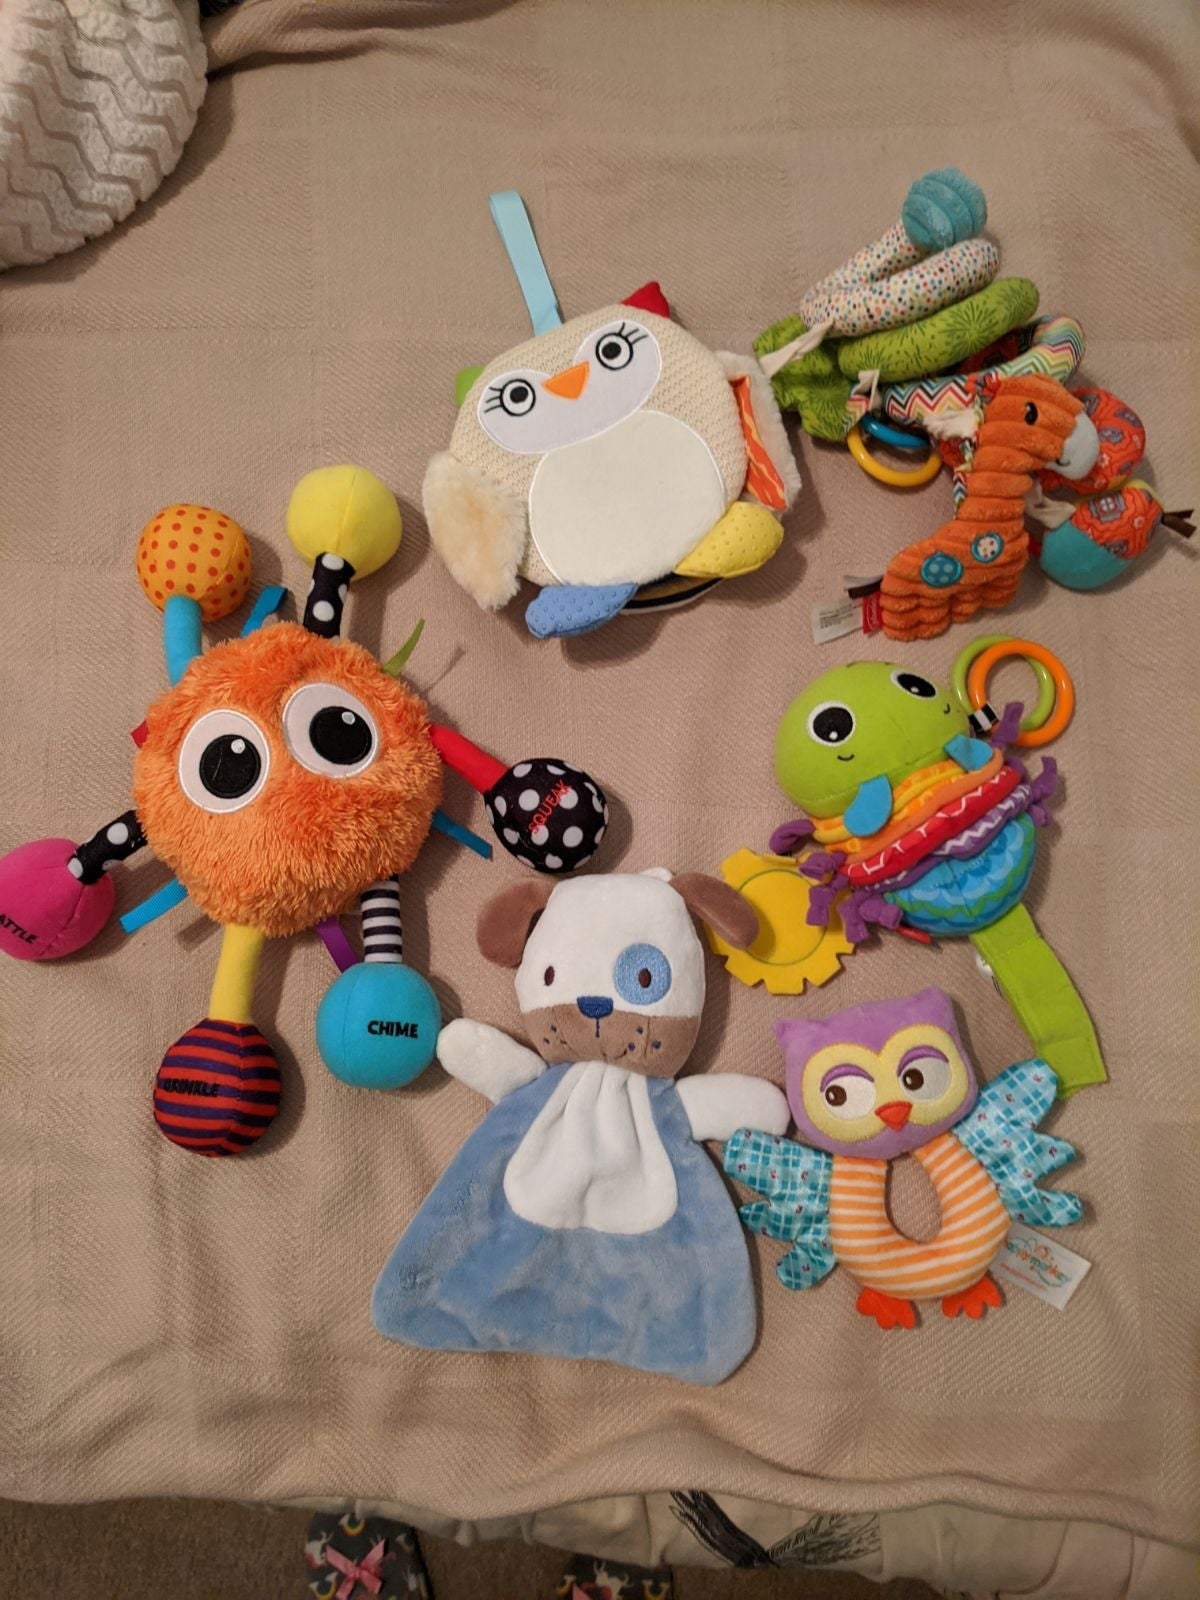 Lot of Baby Plush Crib Stroller Toys